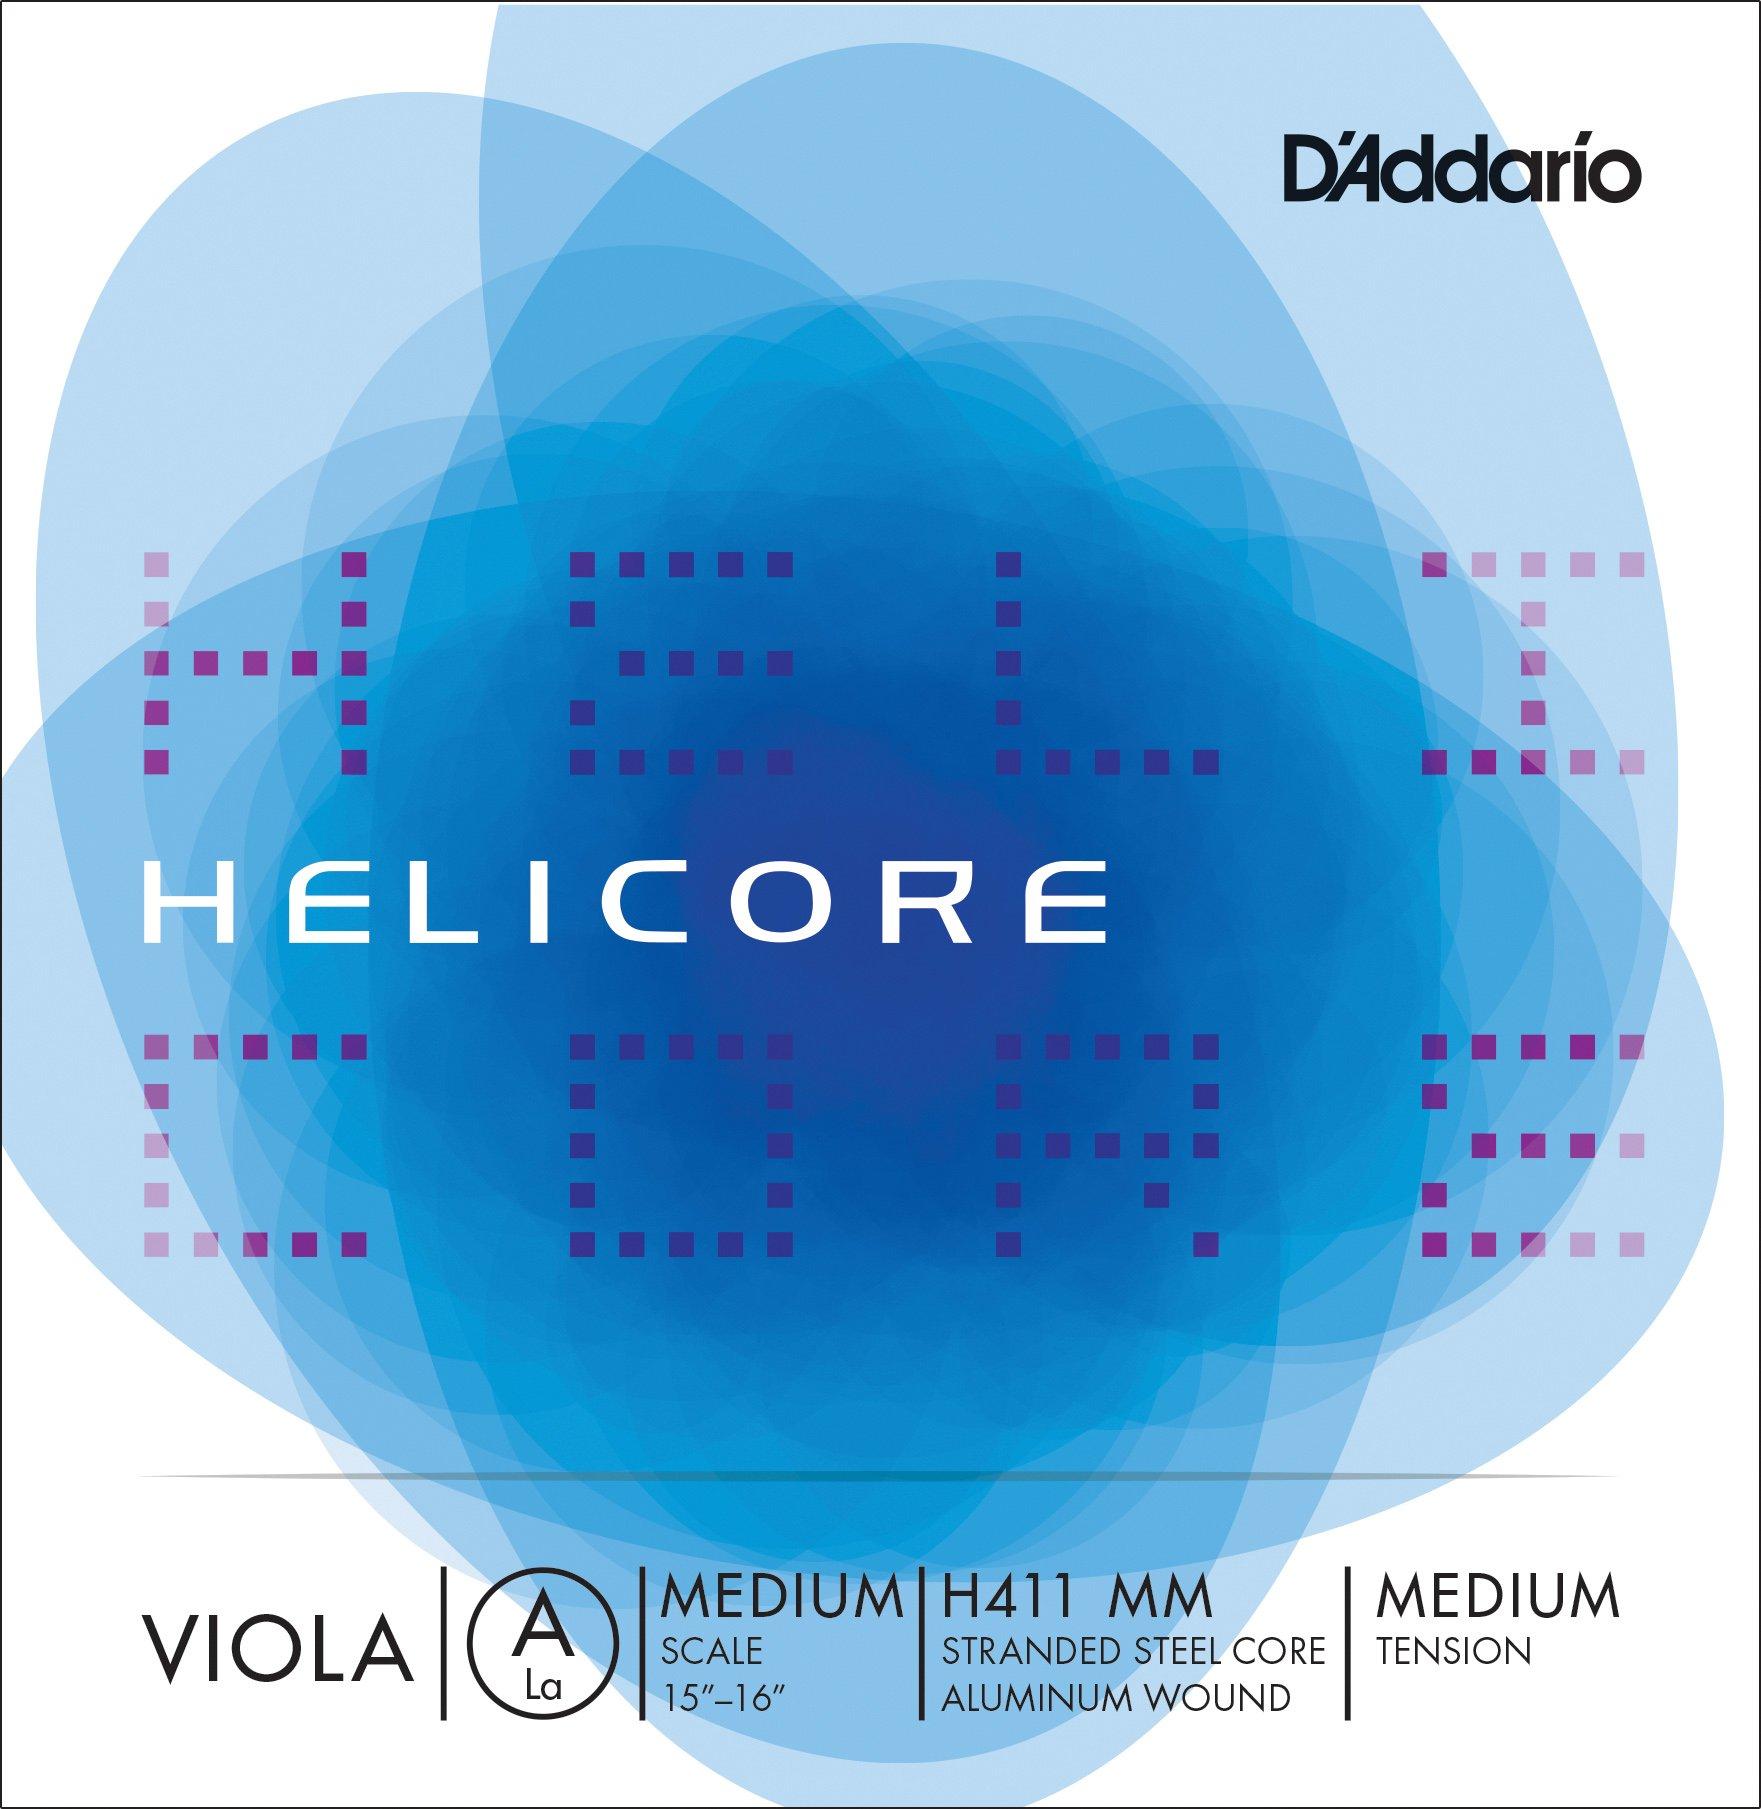 D'Addario Helicore Viola Single A String, Medium Scale, Medium Tension